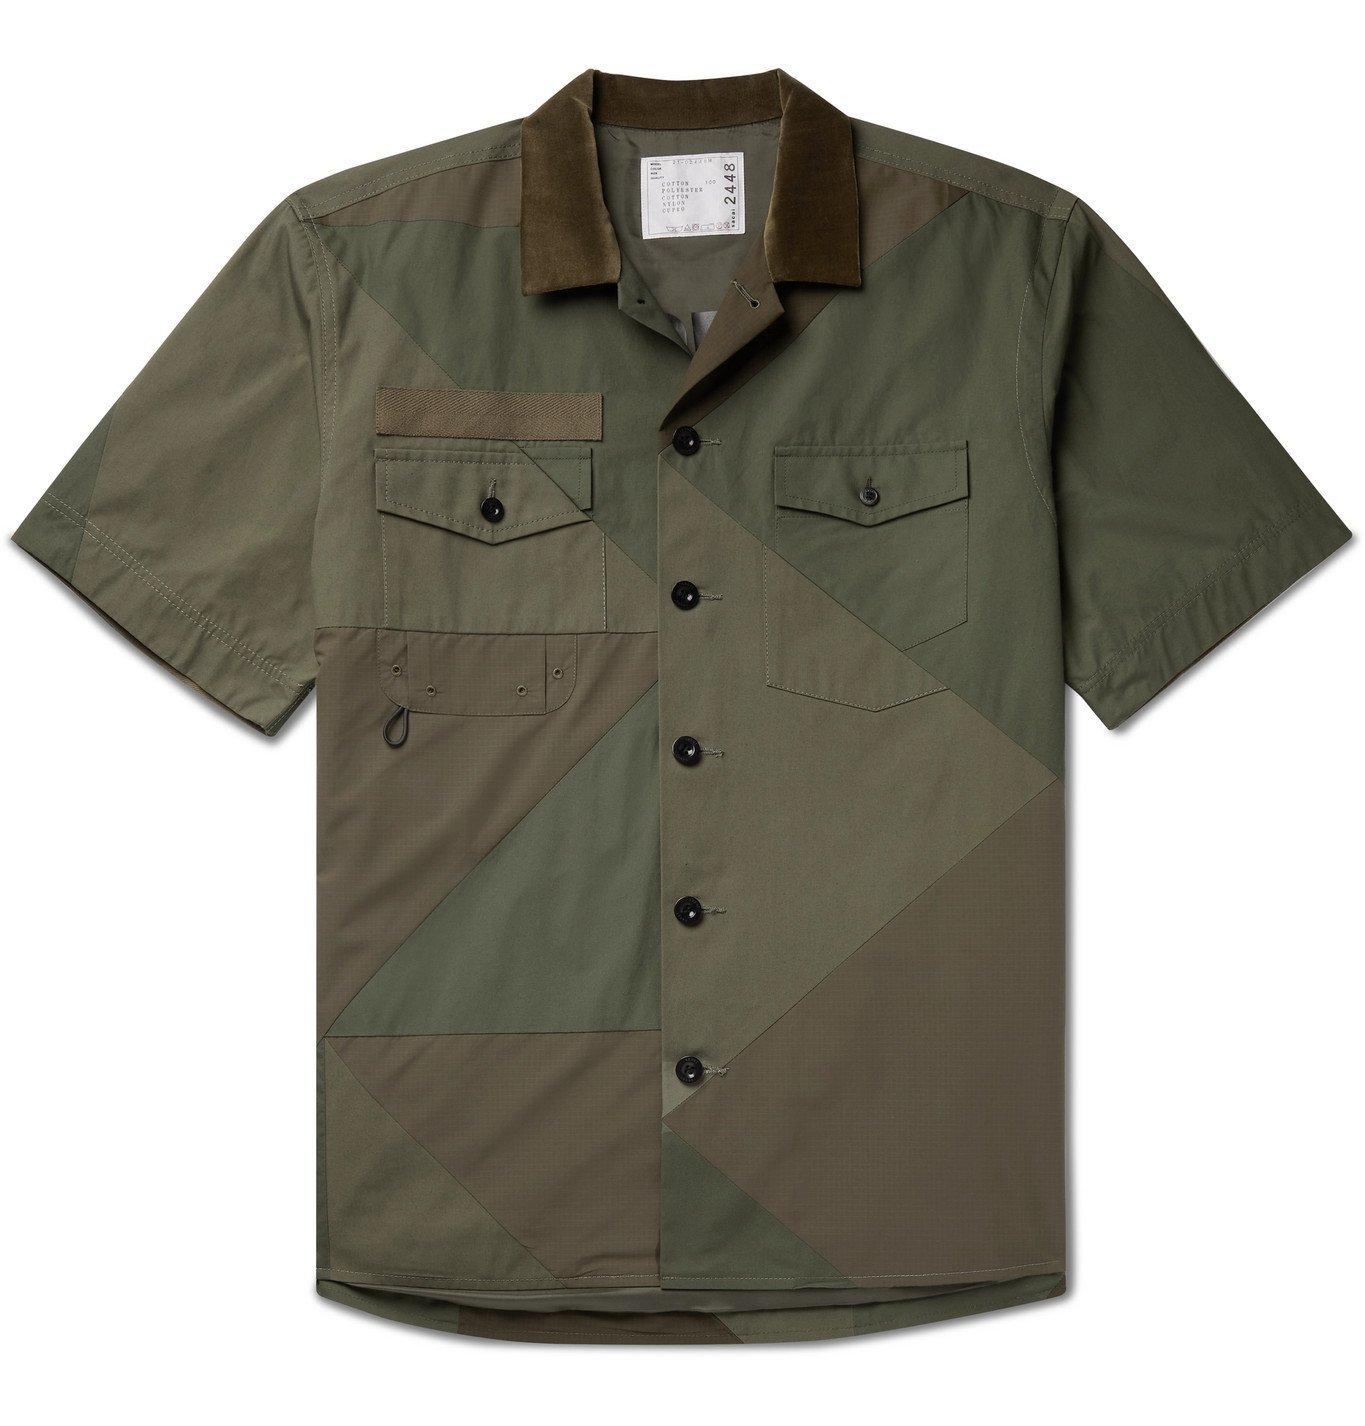 Sacai - Hank Willis Thomas Velvet-Trimmed Panelled Cotton Shirt - Green